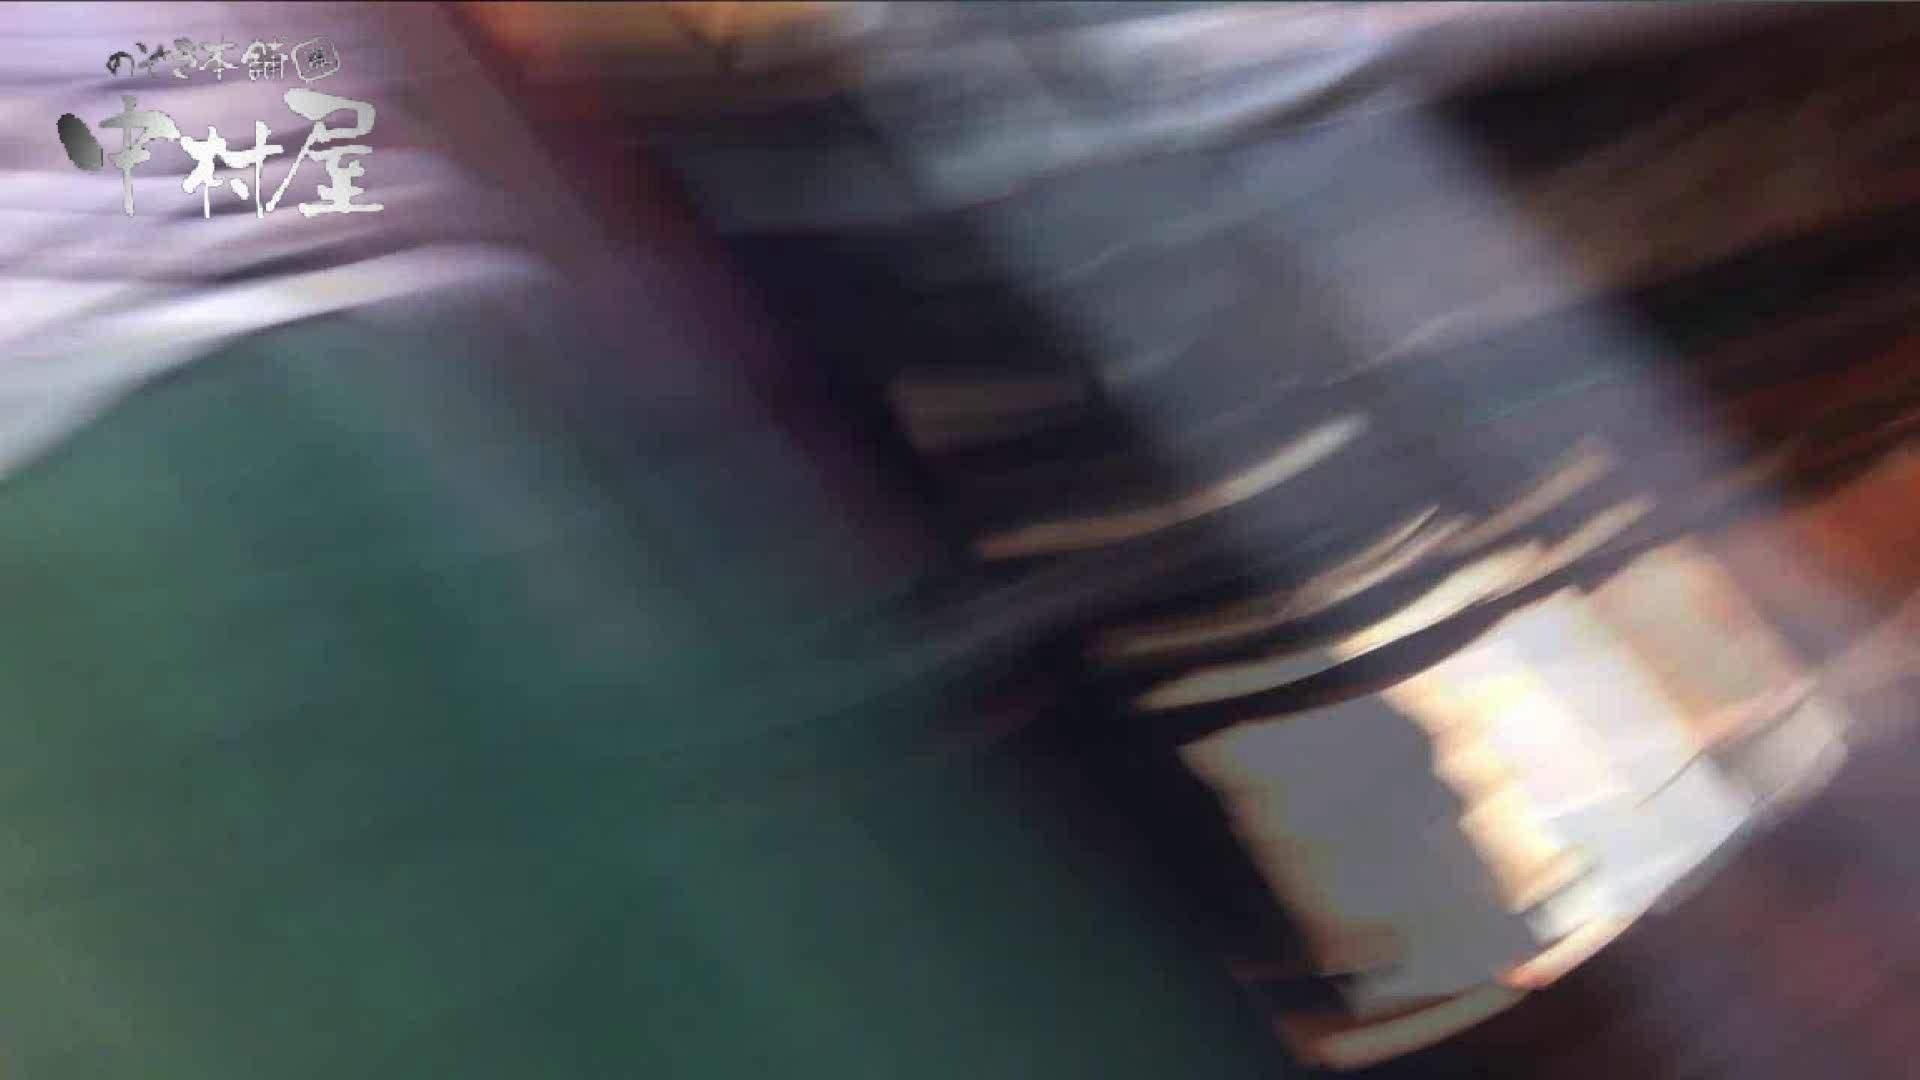 vol.52 美人アパレル胸チラ&パンチラ おとなしそうな店員の胸元にアタック! 接写 盗撮ワレメ無修正動画無料 86画像 3